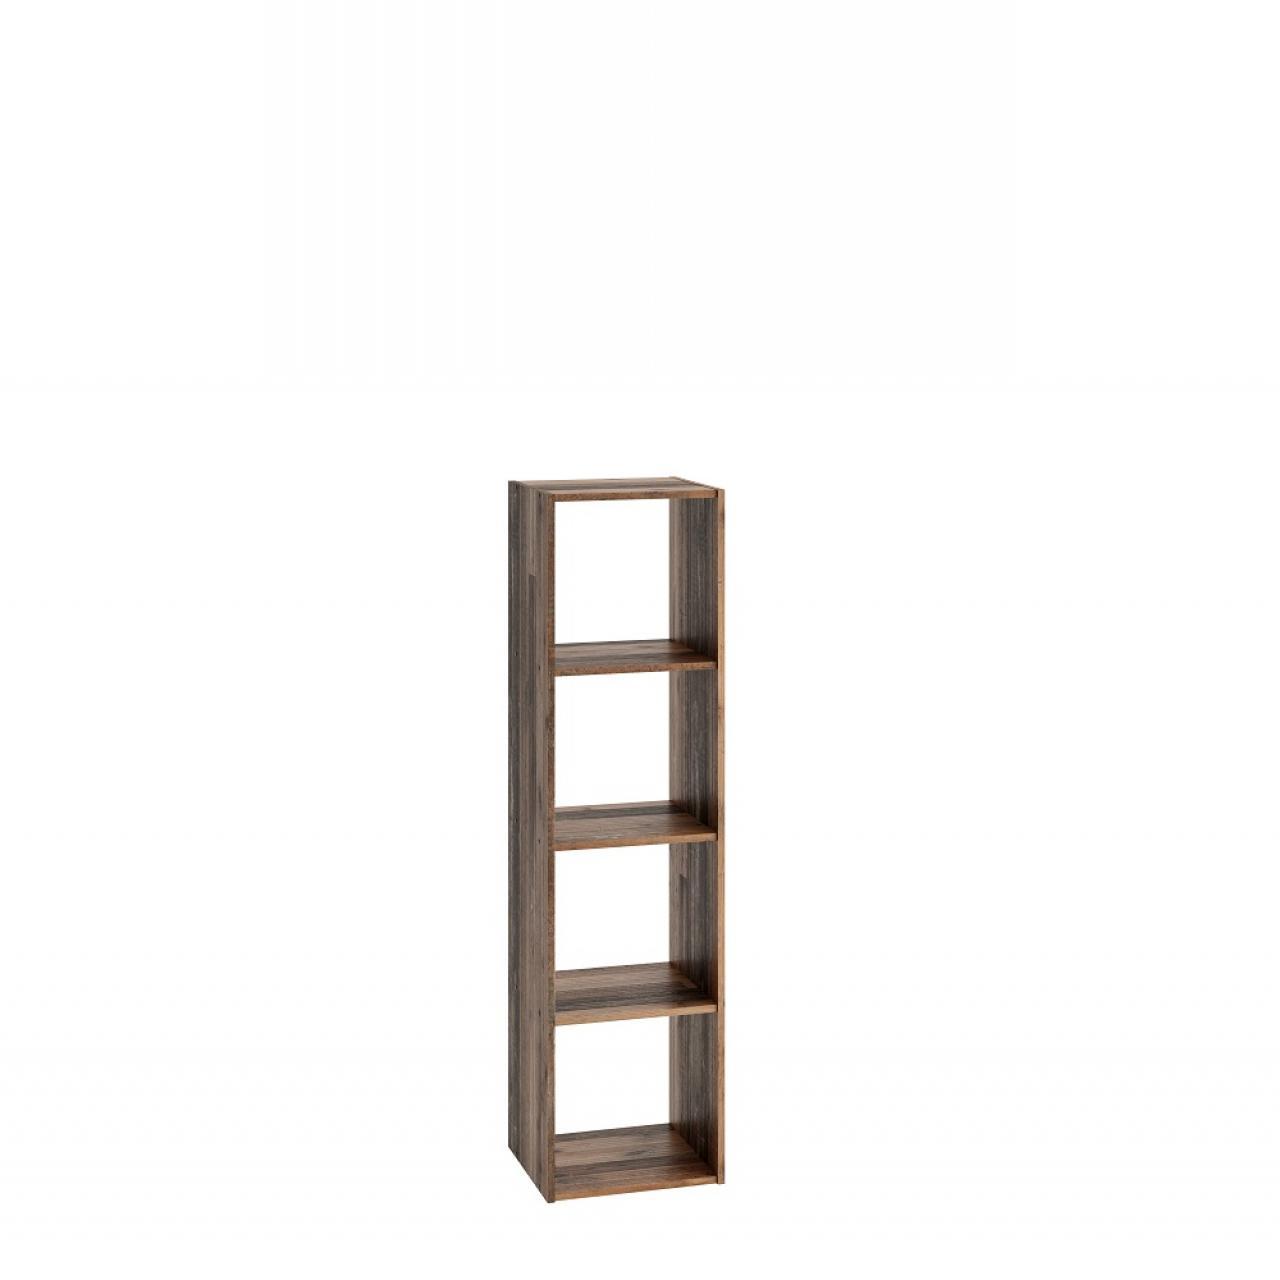 Standregal Bücherregal Mega 4 248-004 Old Style Dunkel 4 Fächer Fächerregal Raumteiler